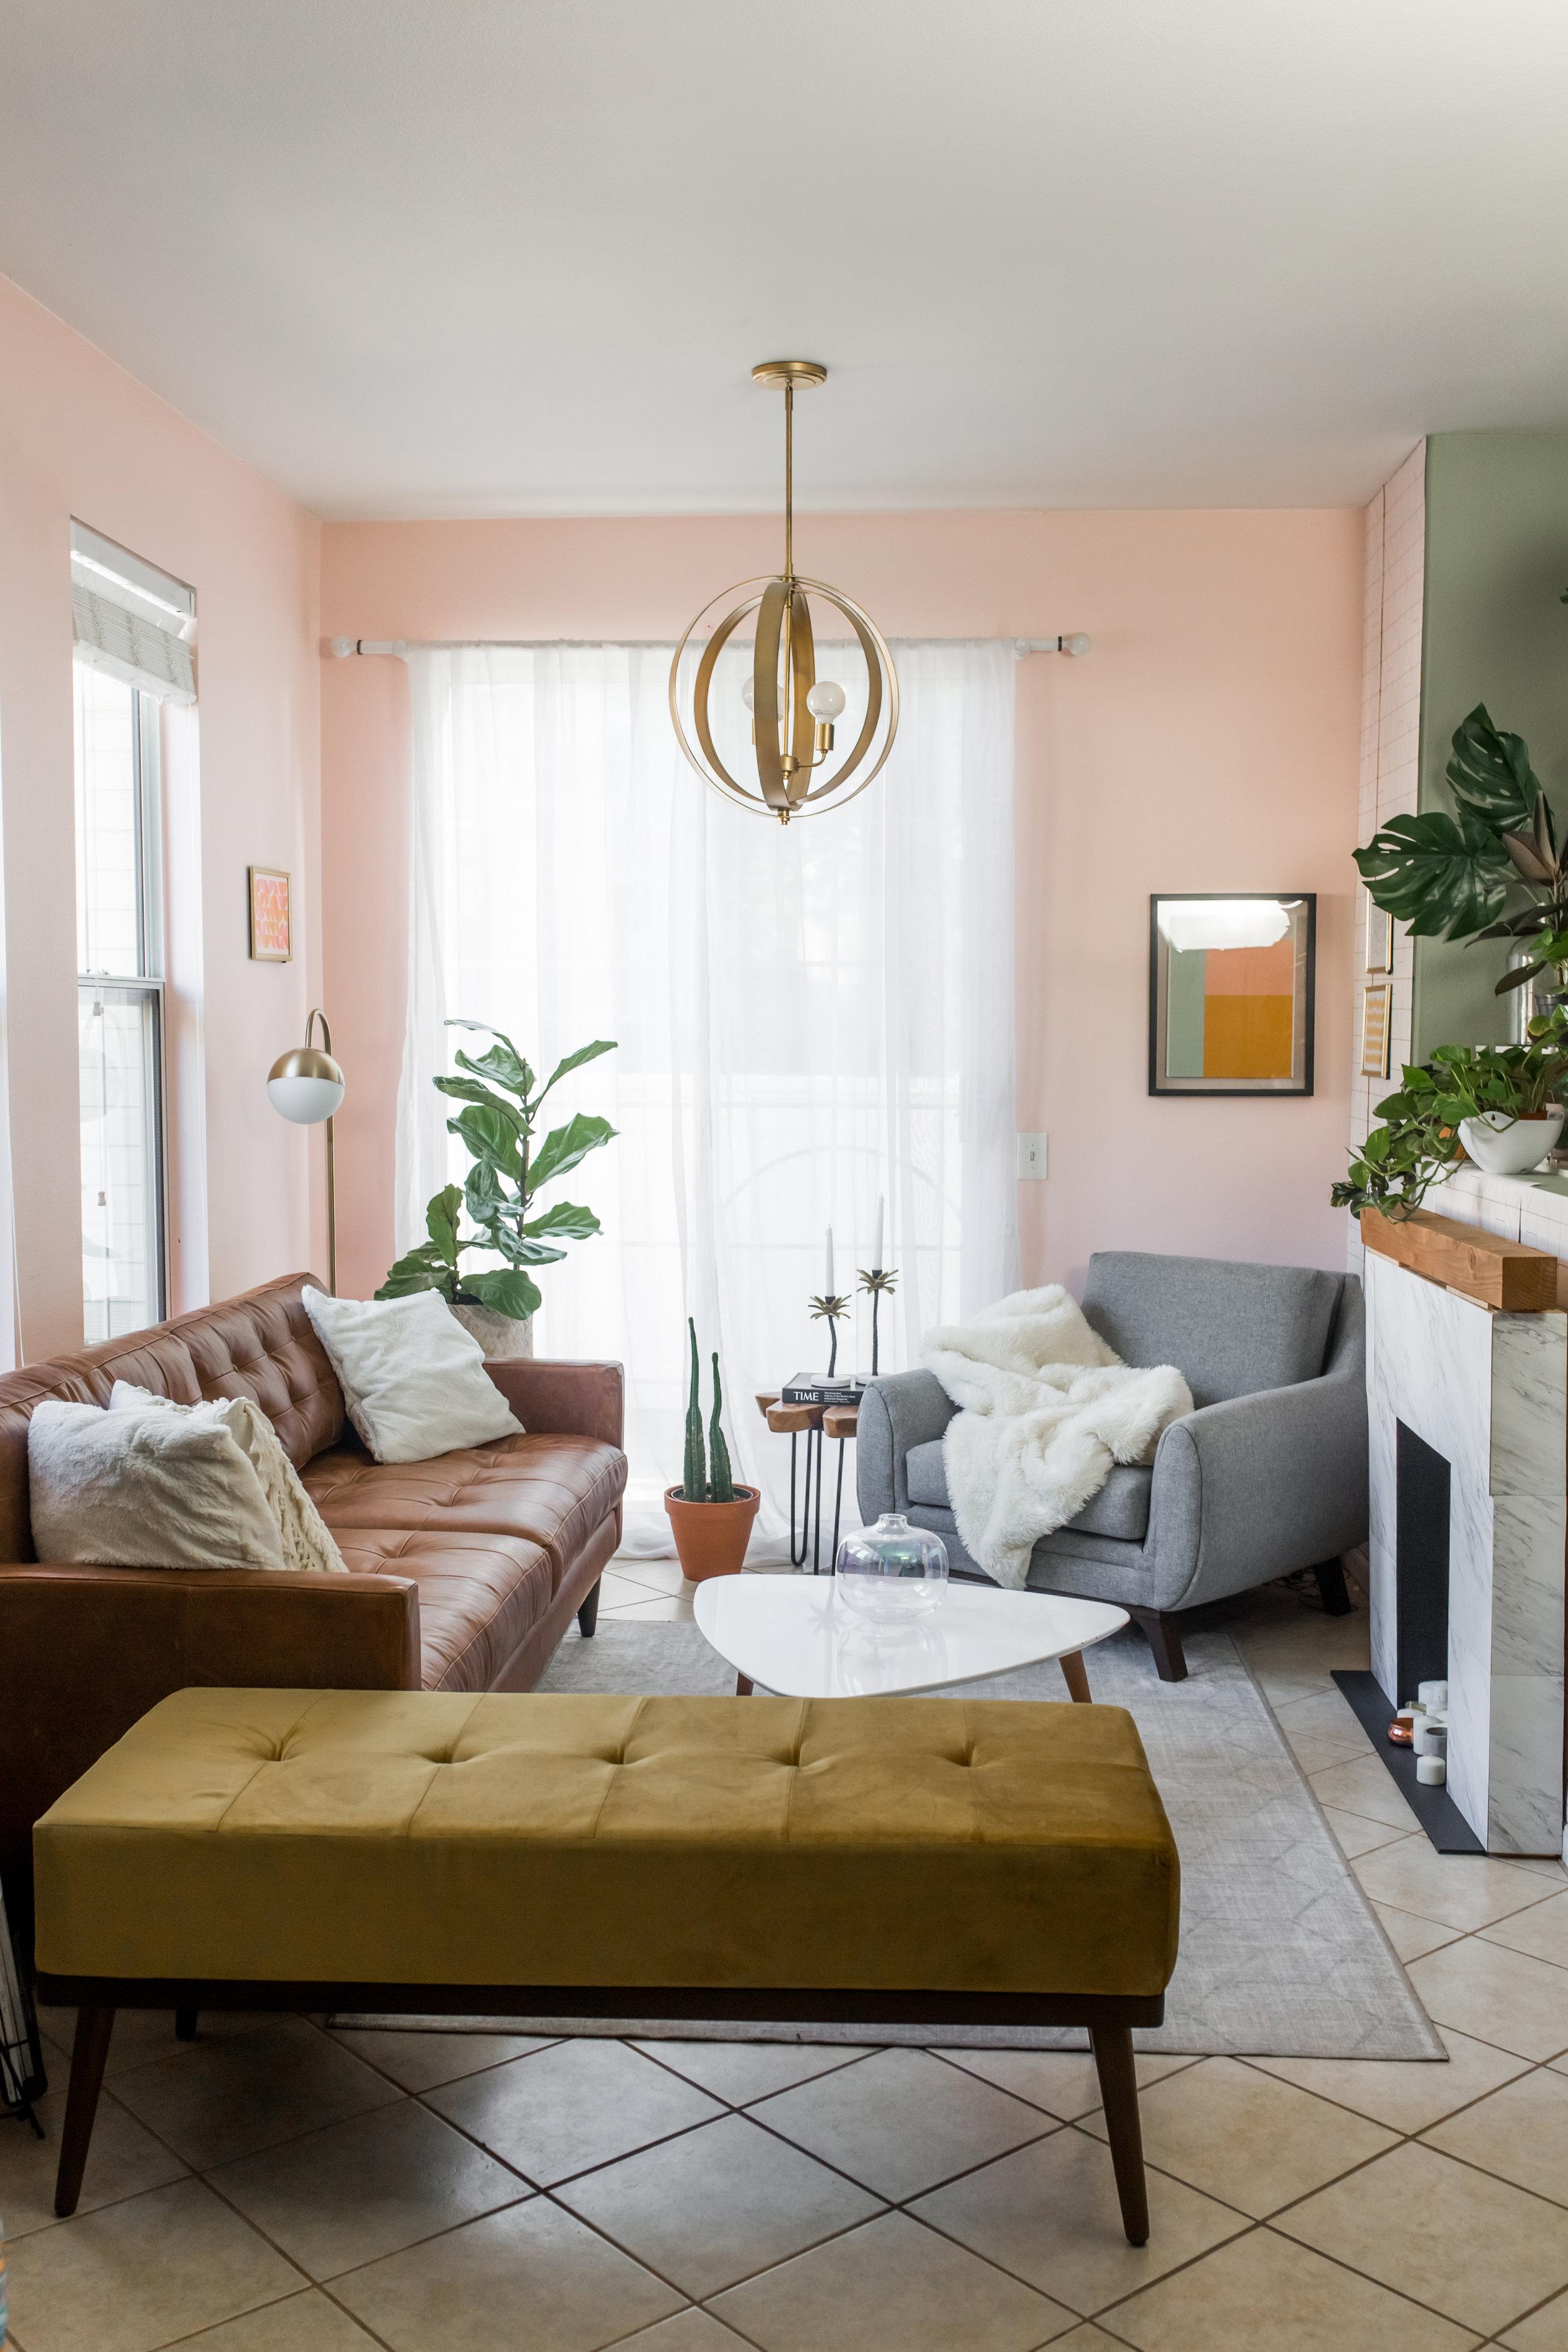 julie-tecson-joybird-living-room-14.jpg